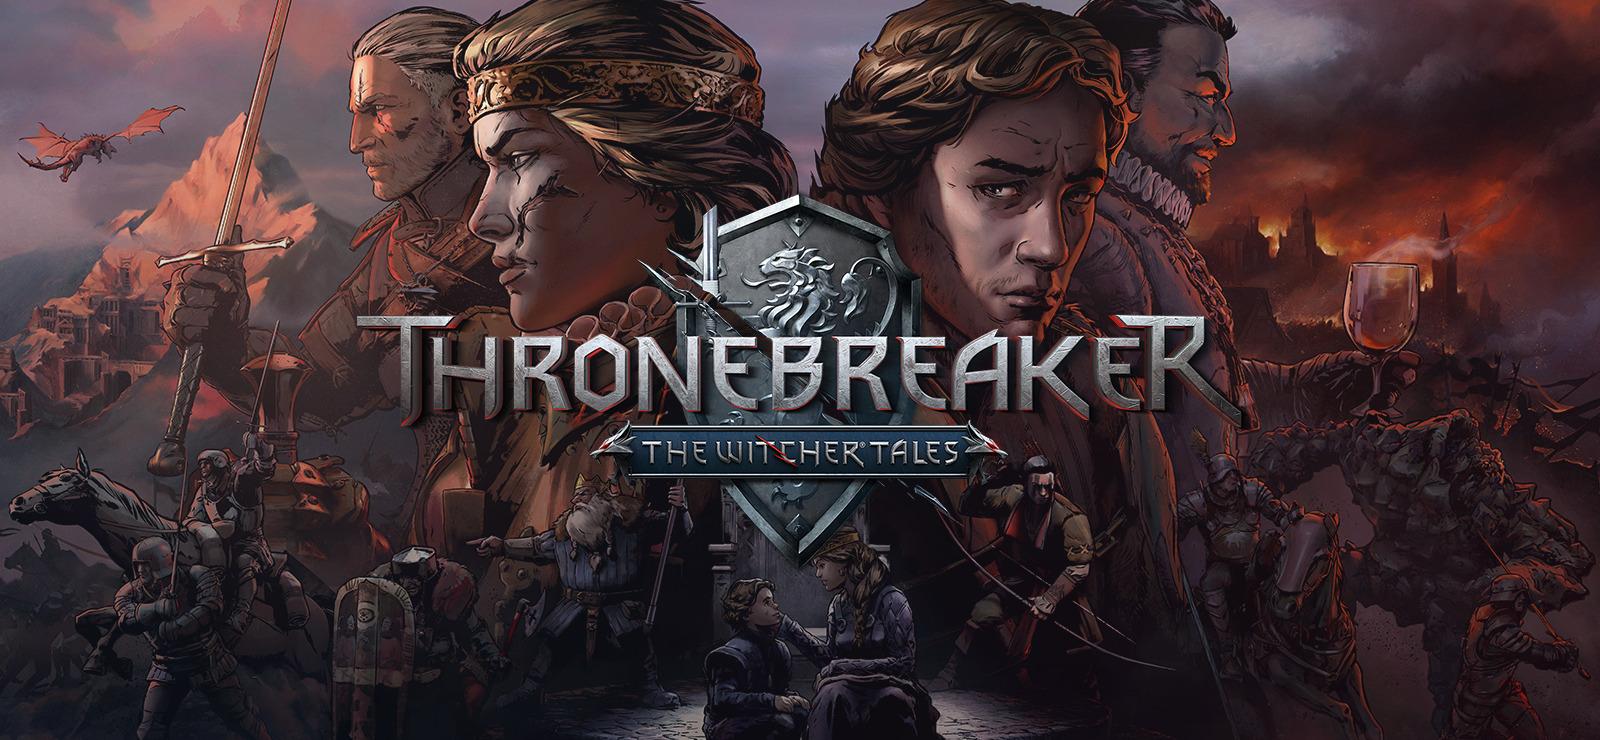 Znalezione obrazy dla zapytania thronebreaker